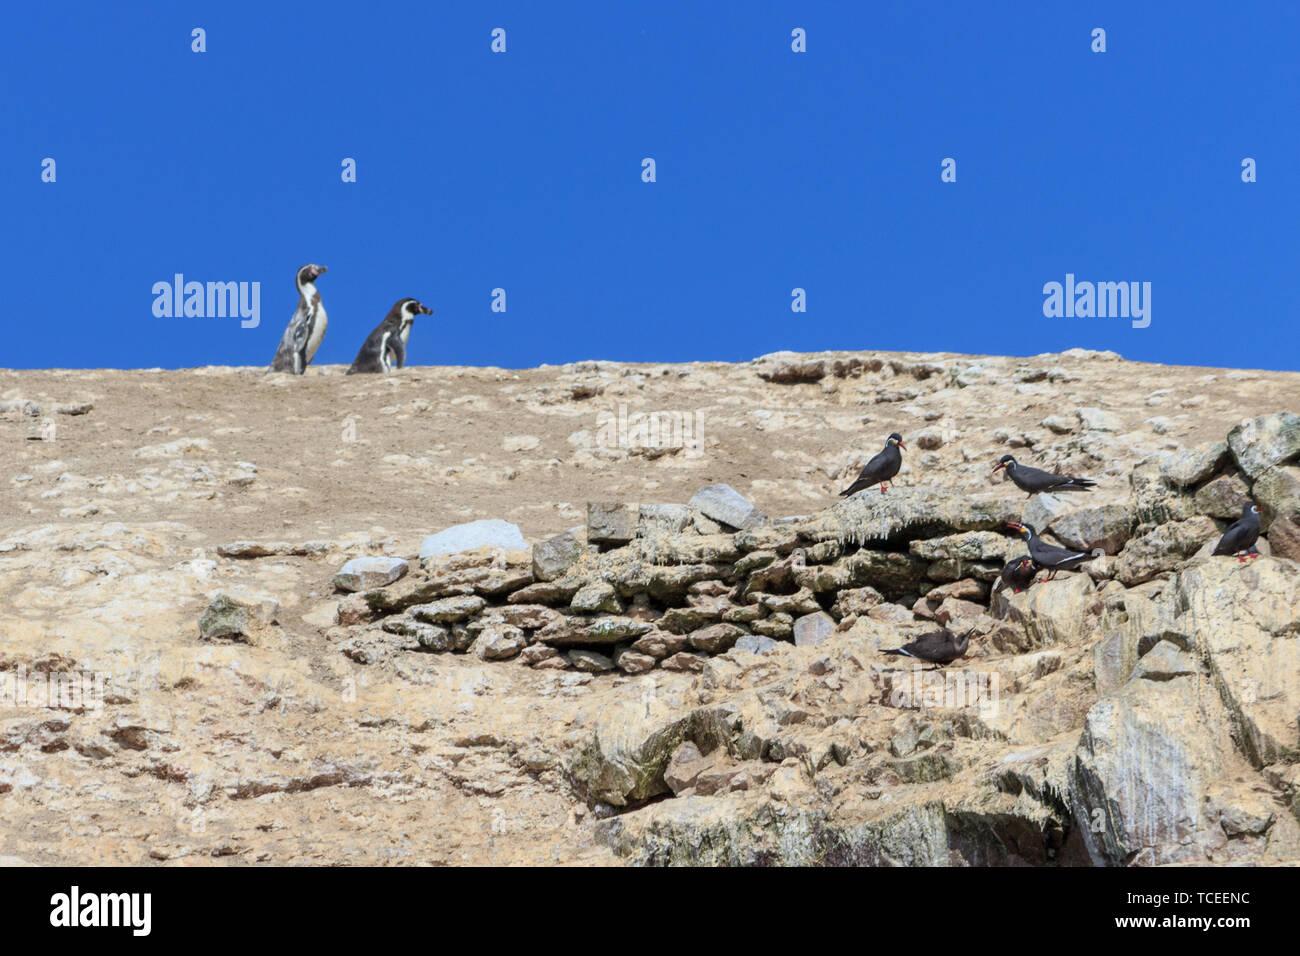 two Humboldt Penguin on the islas ballestas, peru - Stock Image